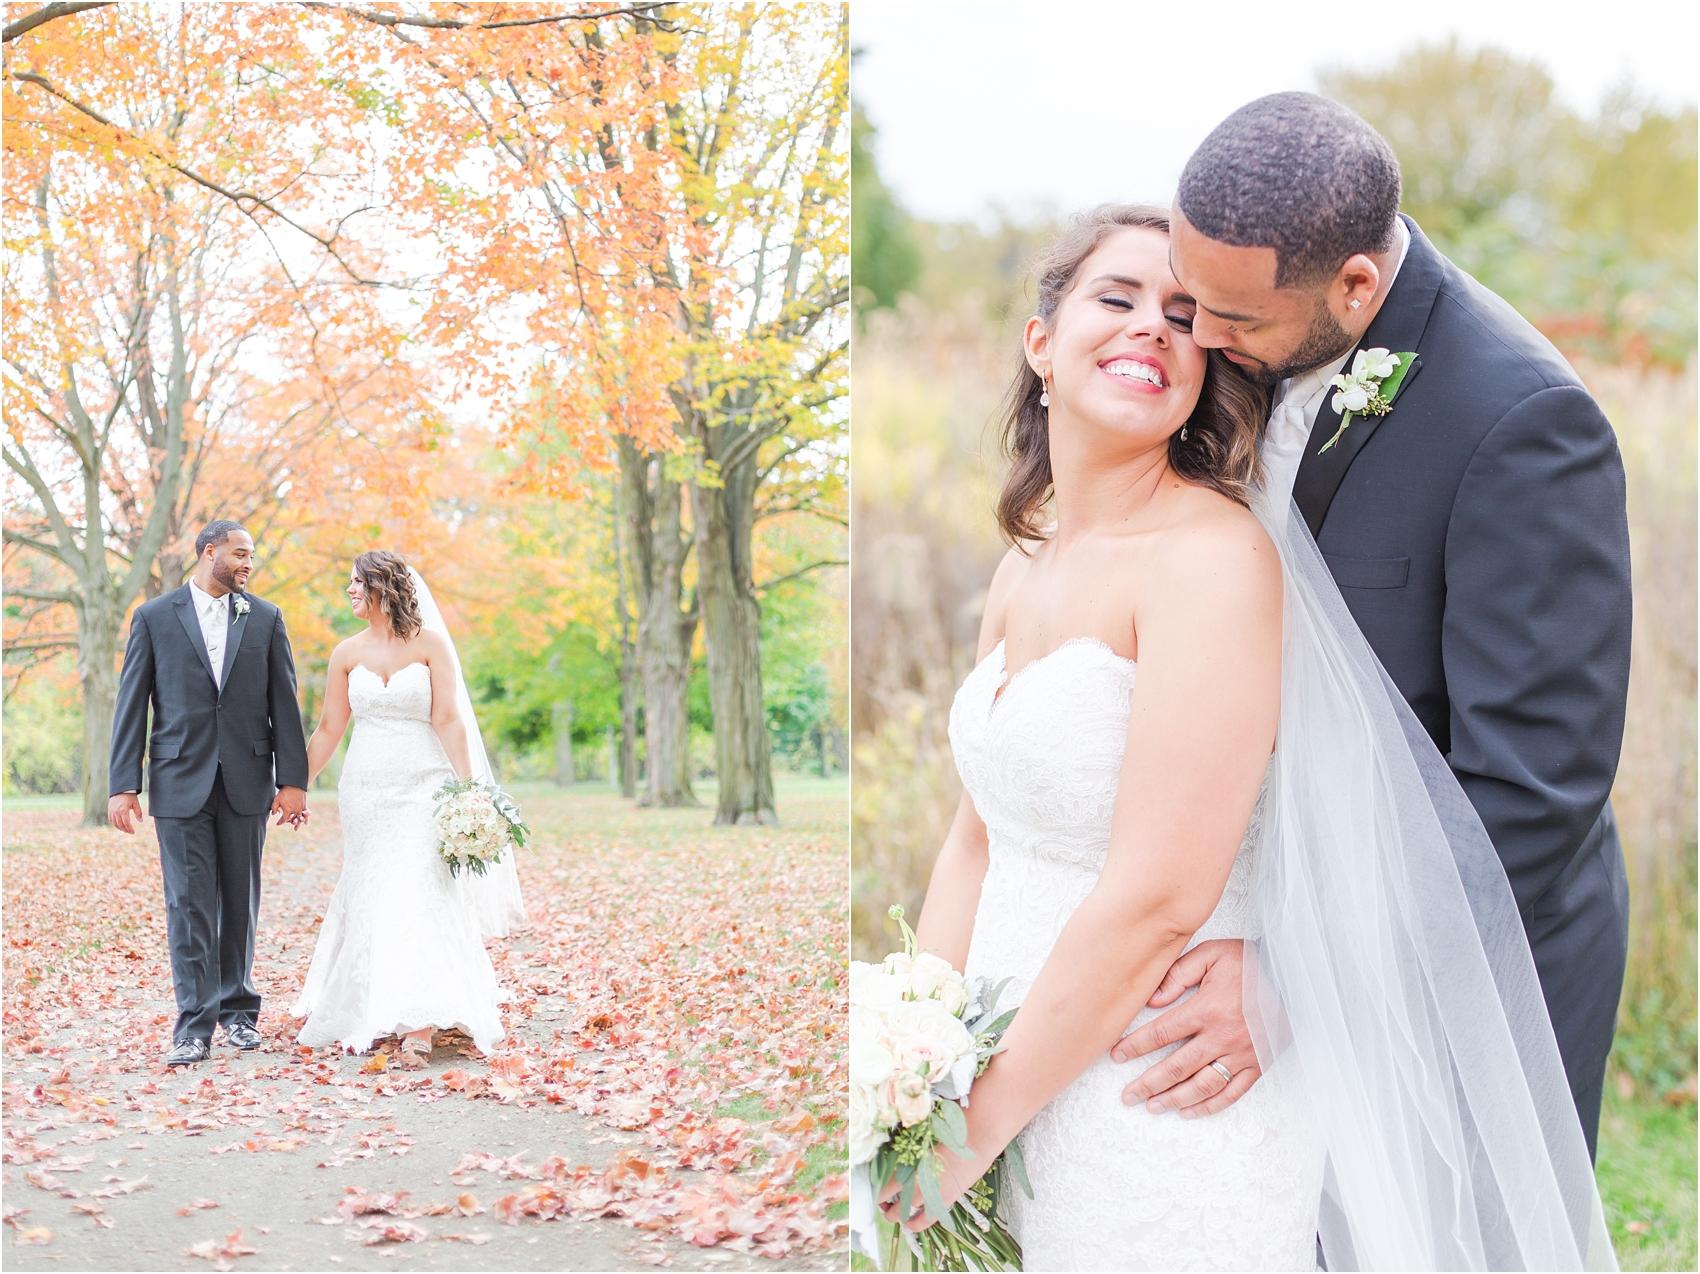 elegant-and-romantic-fall-wedding-photos-at-st-marys-catholic-church-in-monroe-michigan-by-courtney-carolyn-photography_0054.jpg